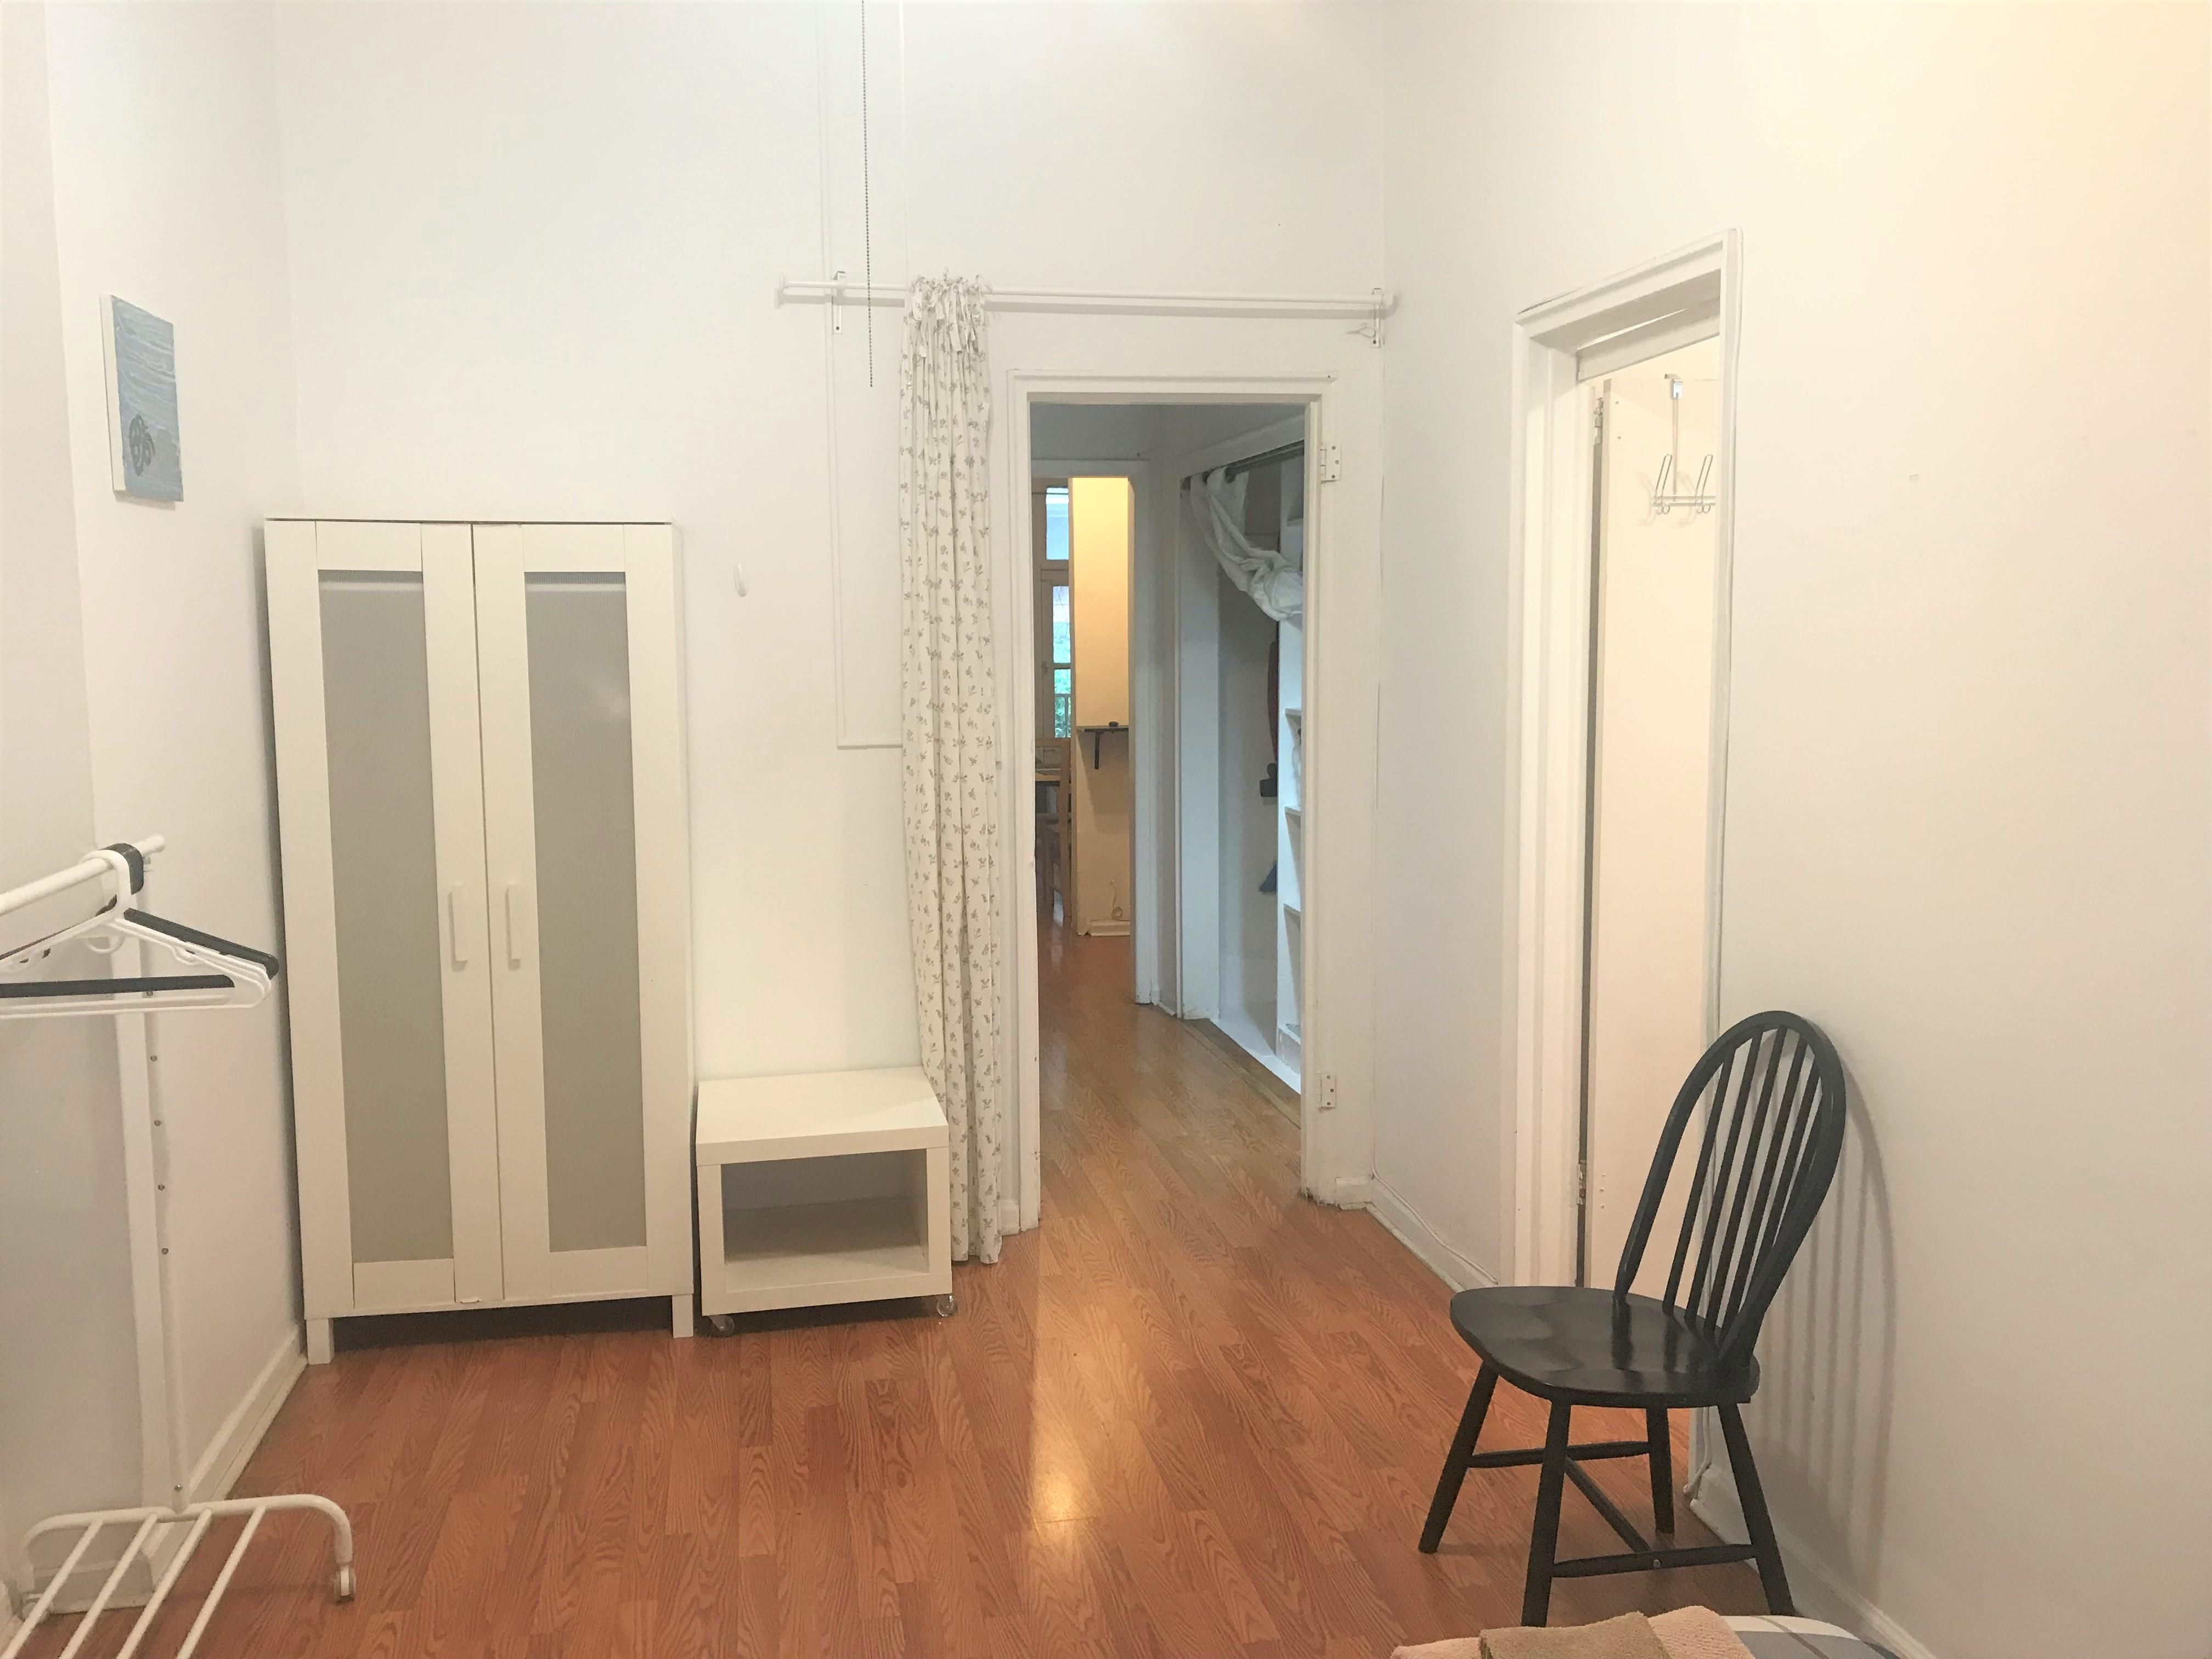 Apartment Murray Hill 2 Bedroom 1 Bathroom photo 5906100